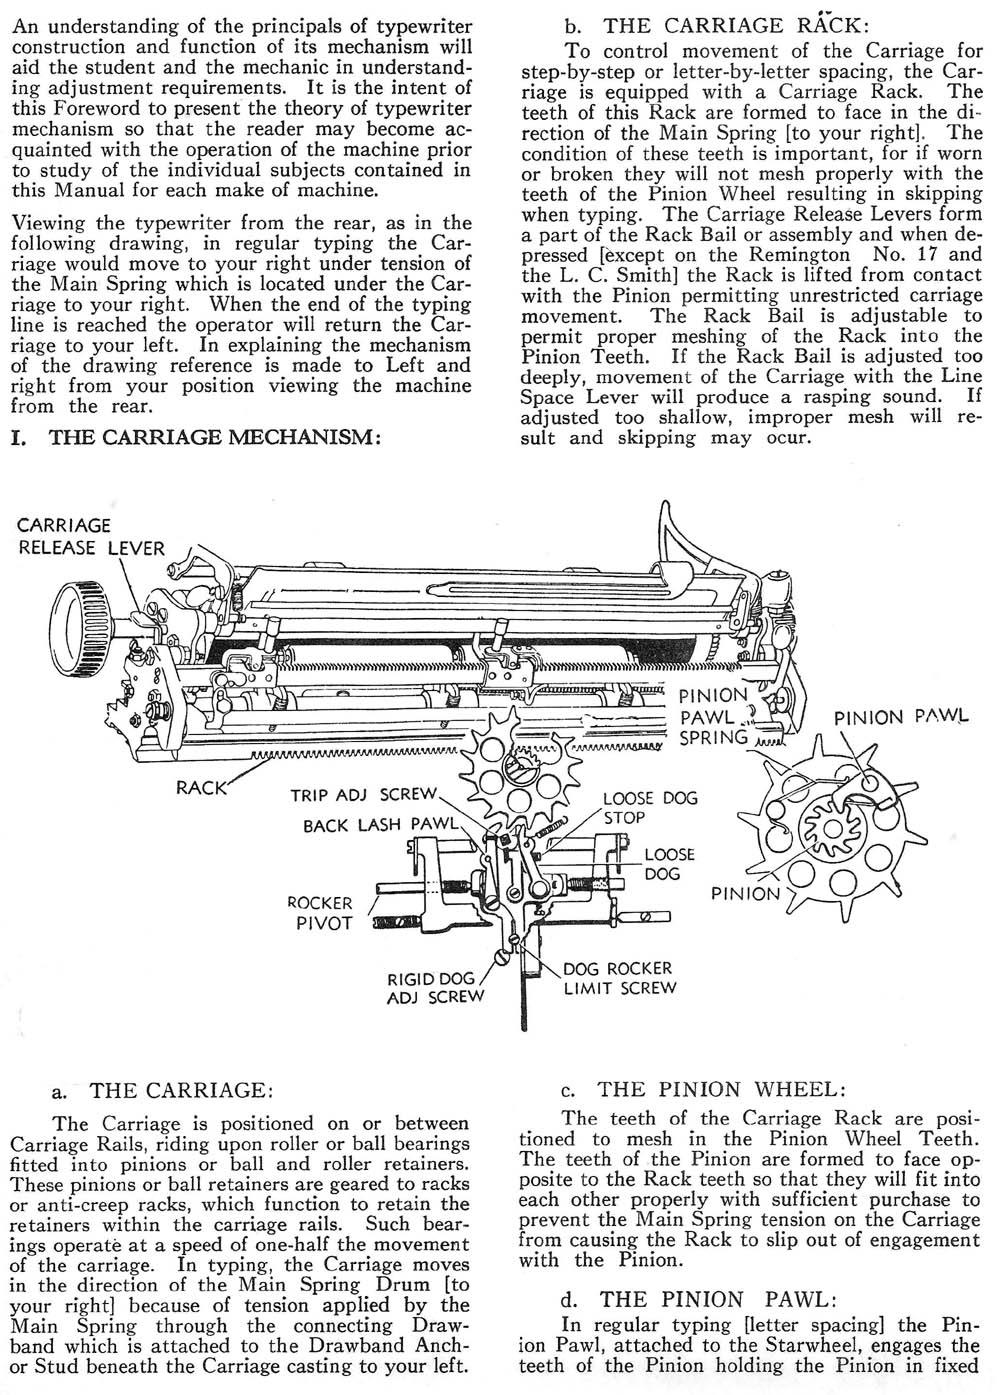 ibm printer service manual how to and user guide instructions u2022 rh taxibermuda co Honda GX120 Parts Diagram Honda GX120 Parts Diagram